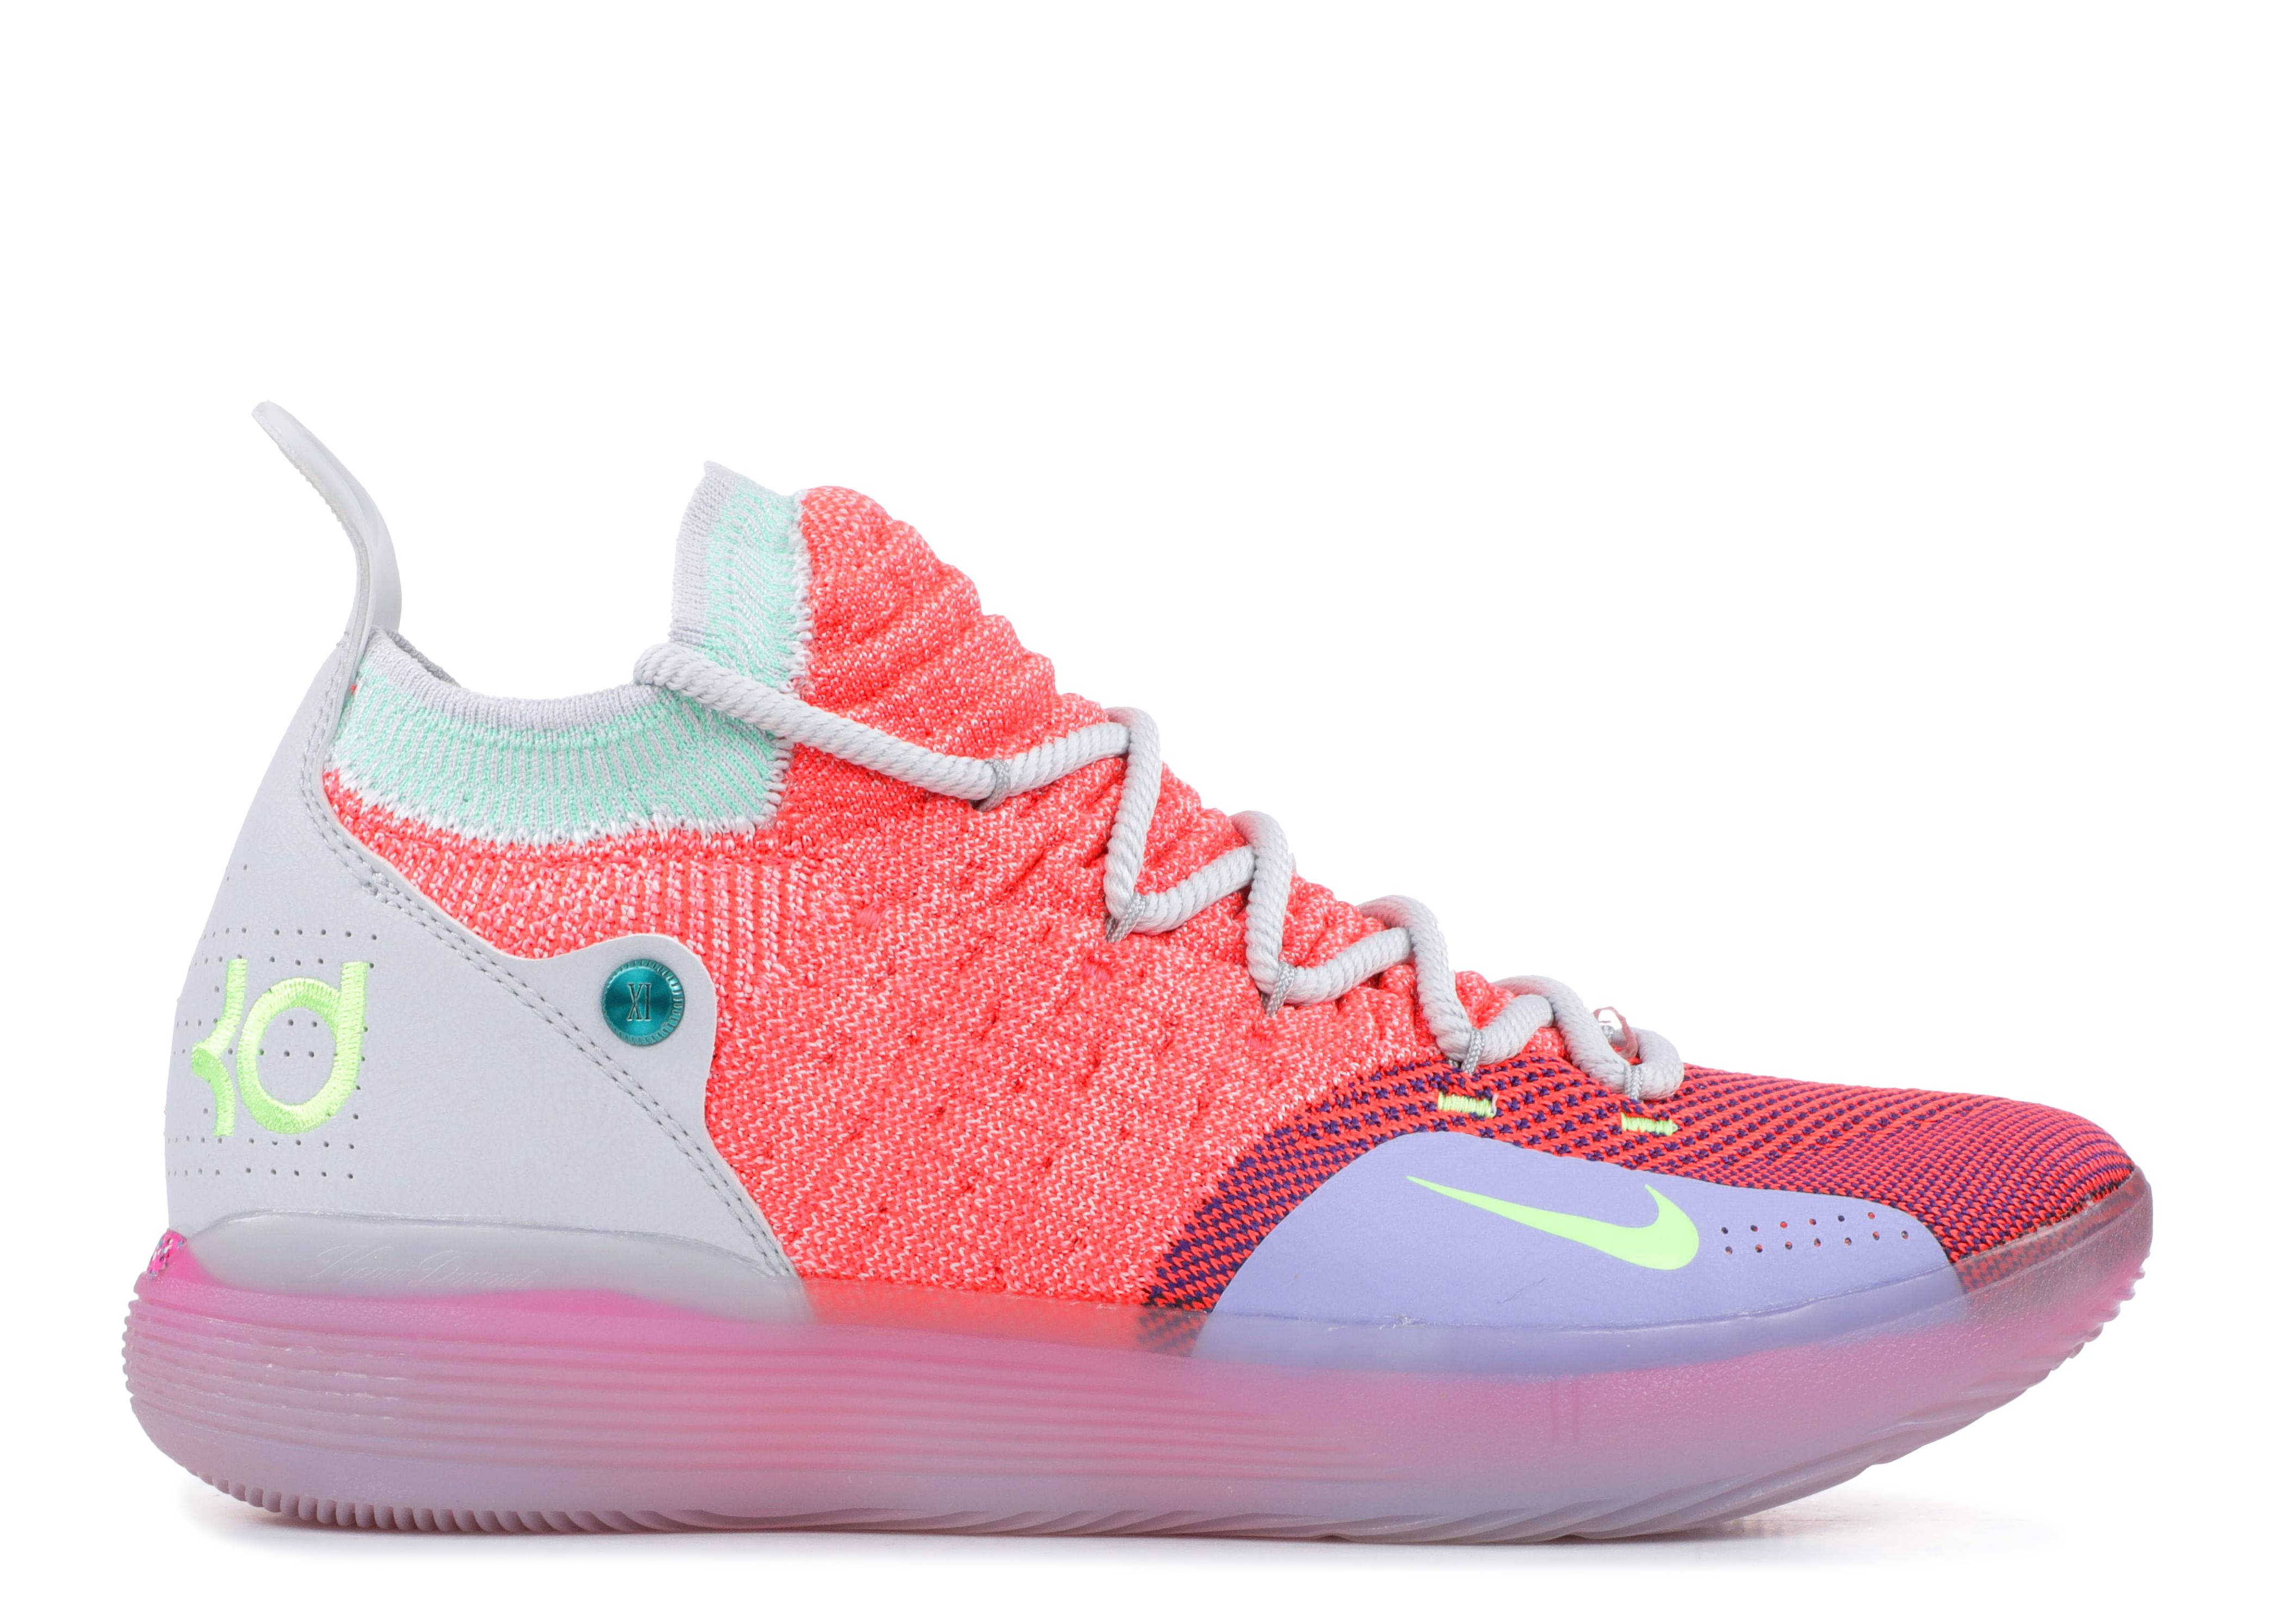 7b9c00150c8f Nike Zoom Kd11